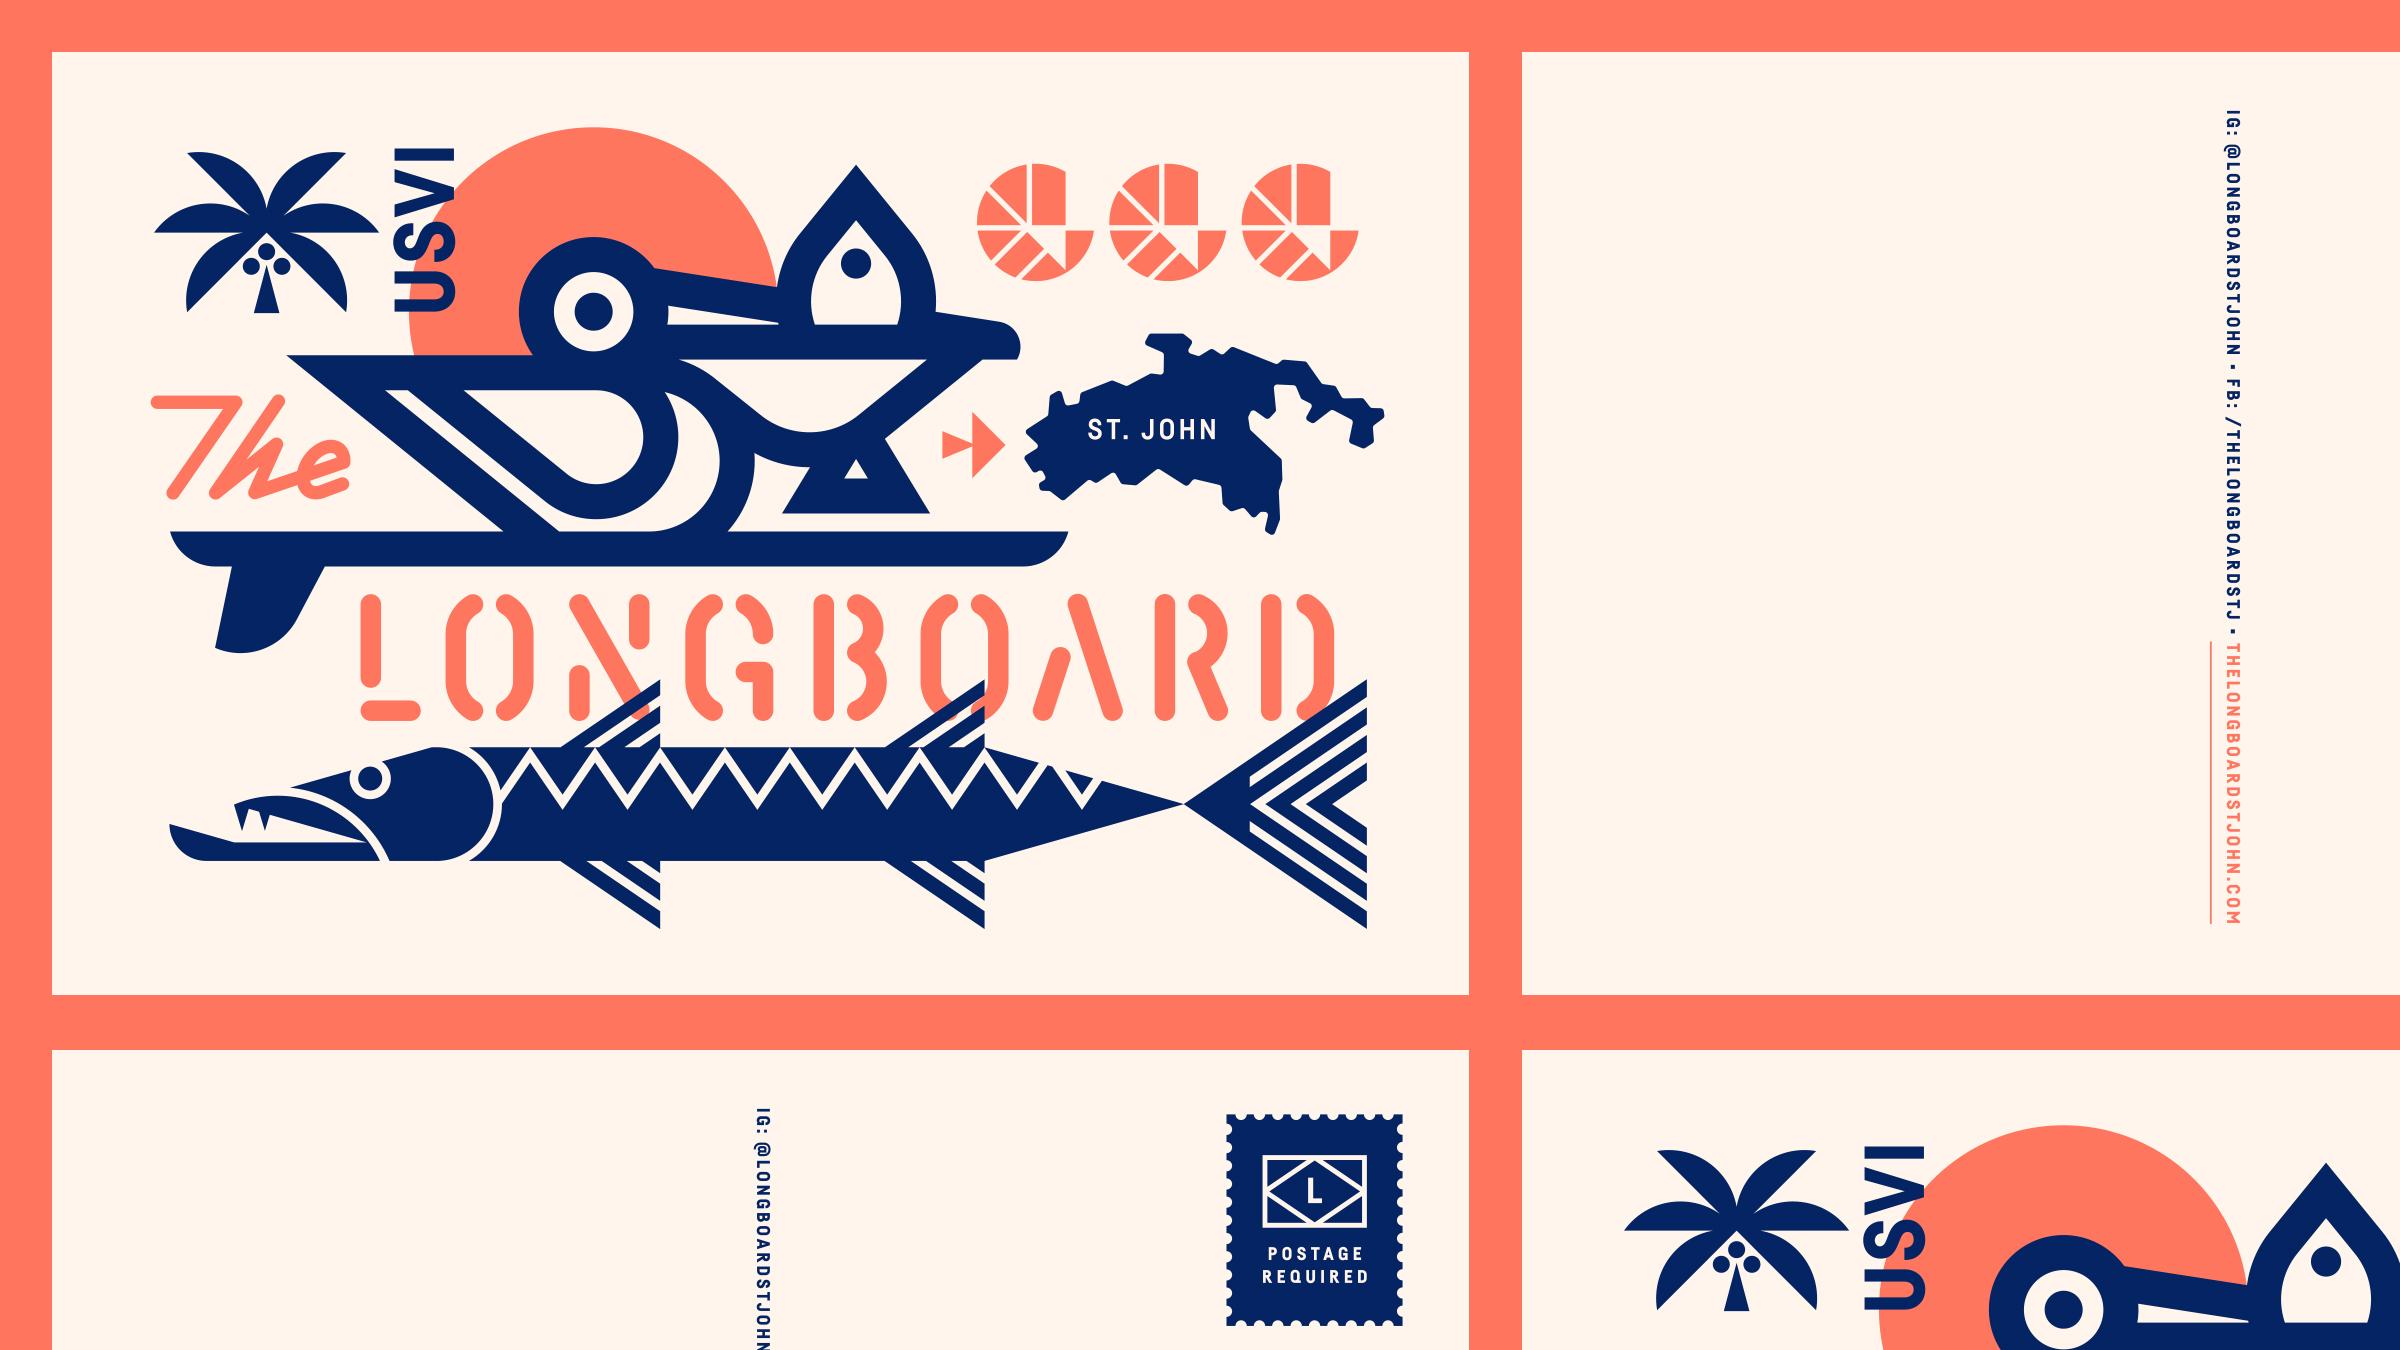 The Longboard Postcard